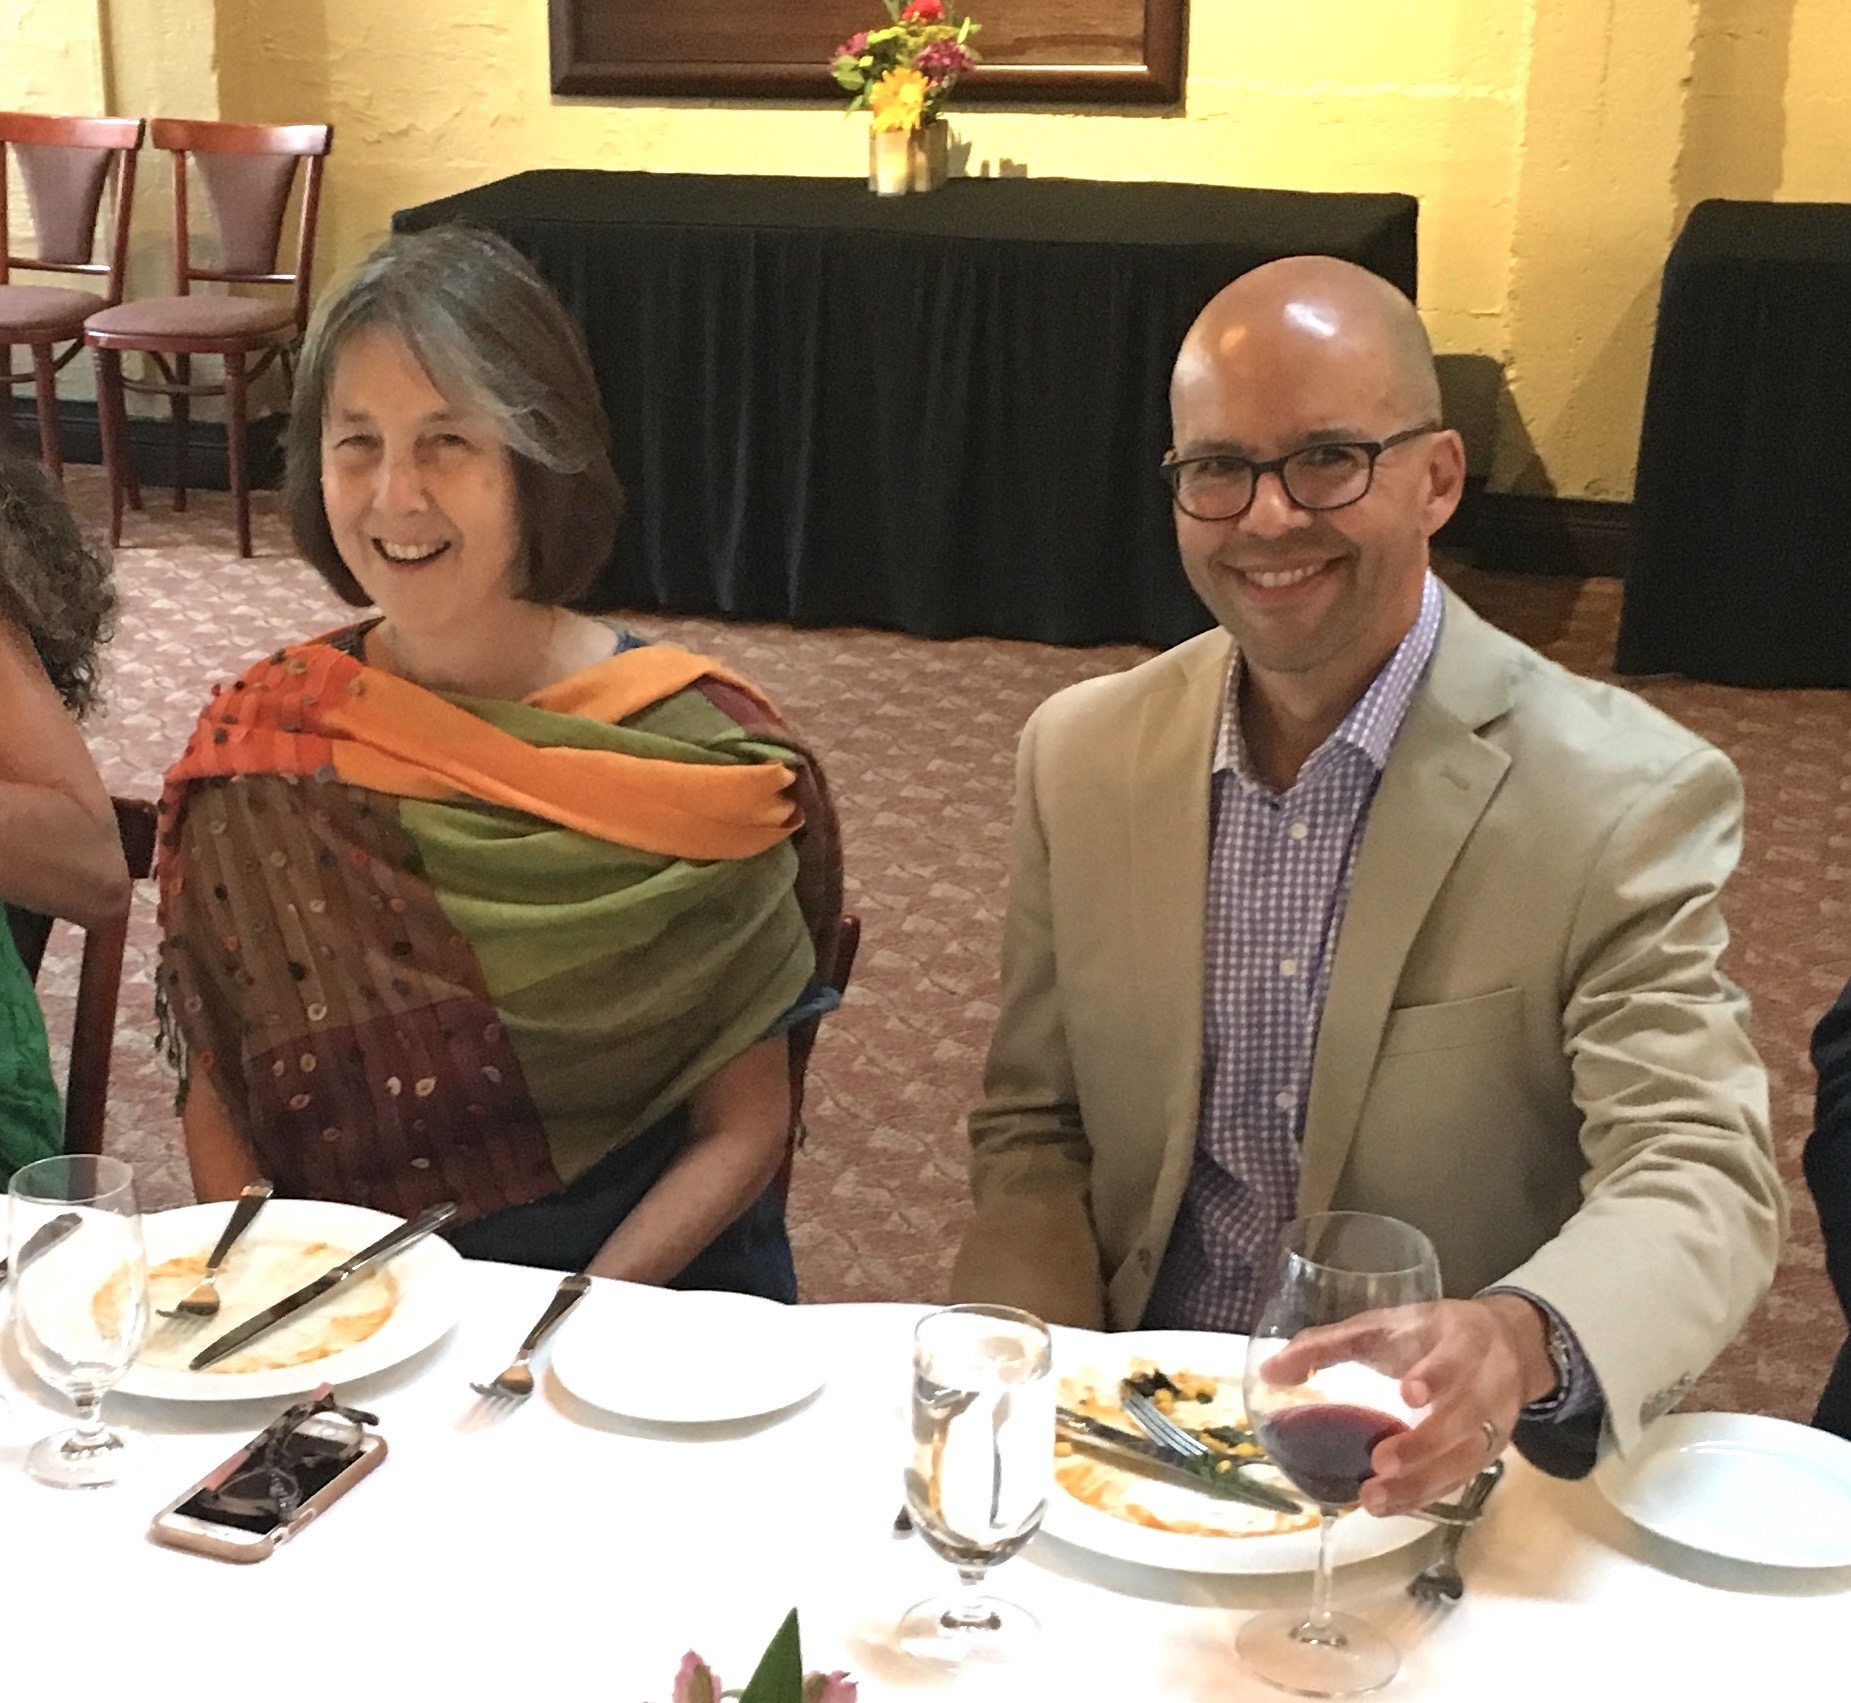 CALSSA lobbyist Will Gonzalez and Sen. Nancy Skinner enjoy some time together